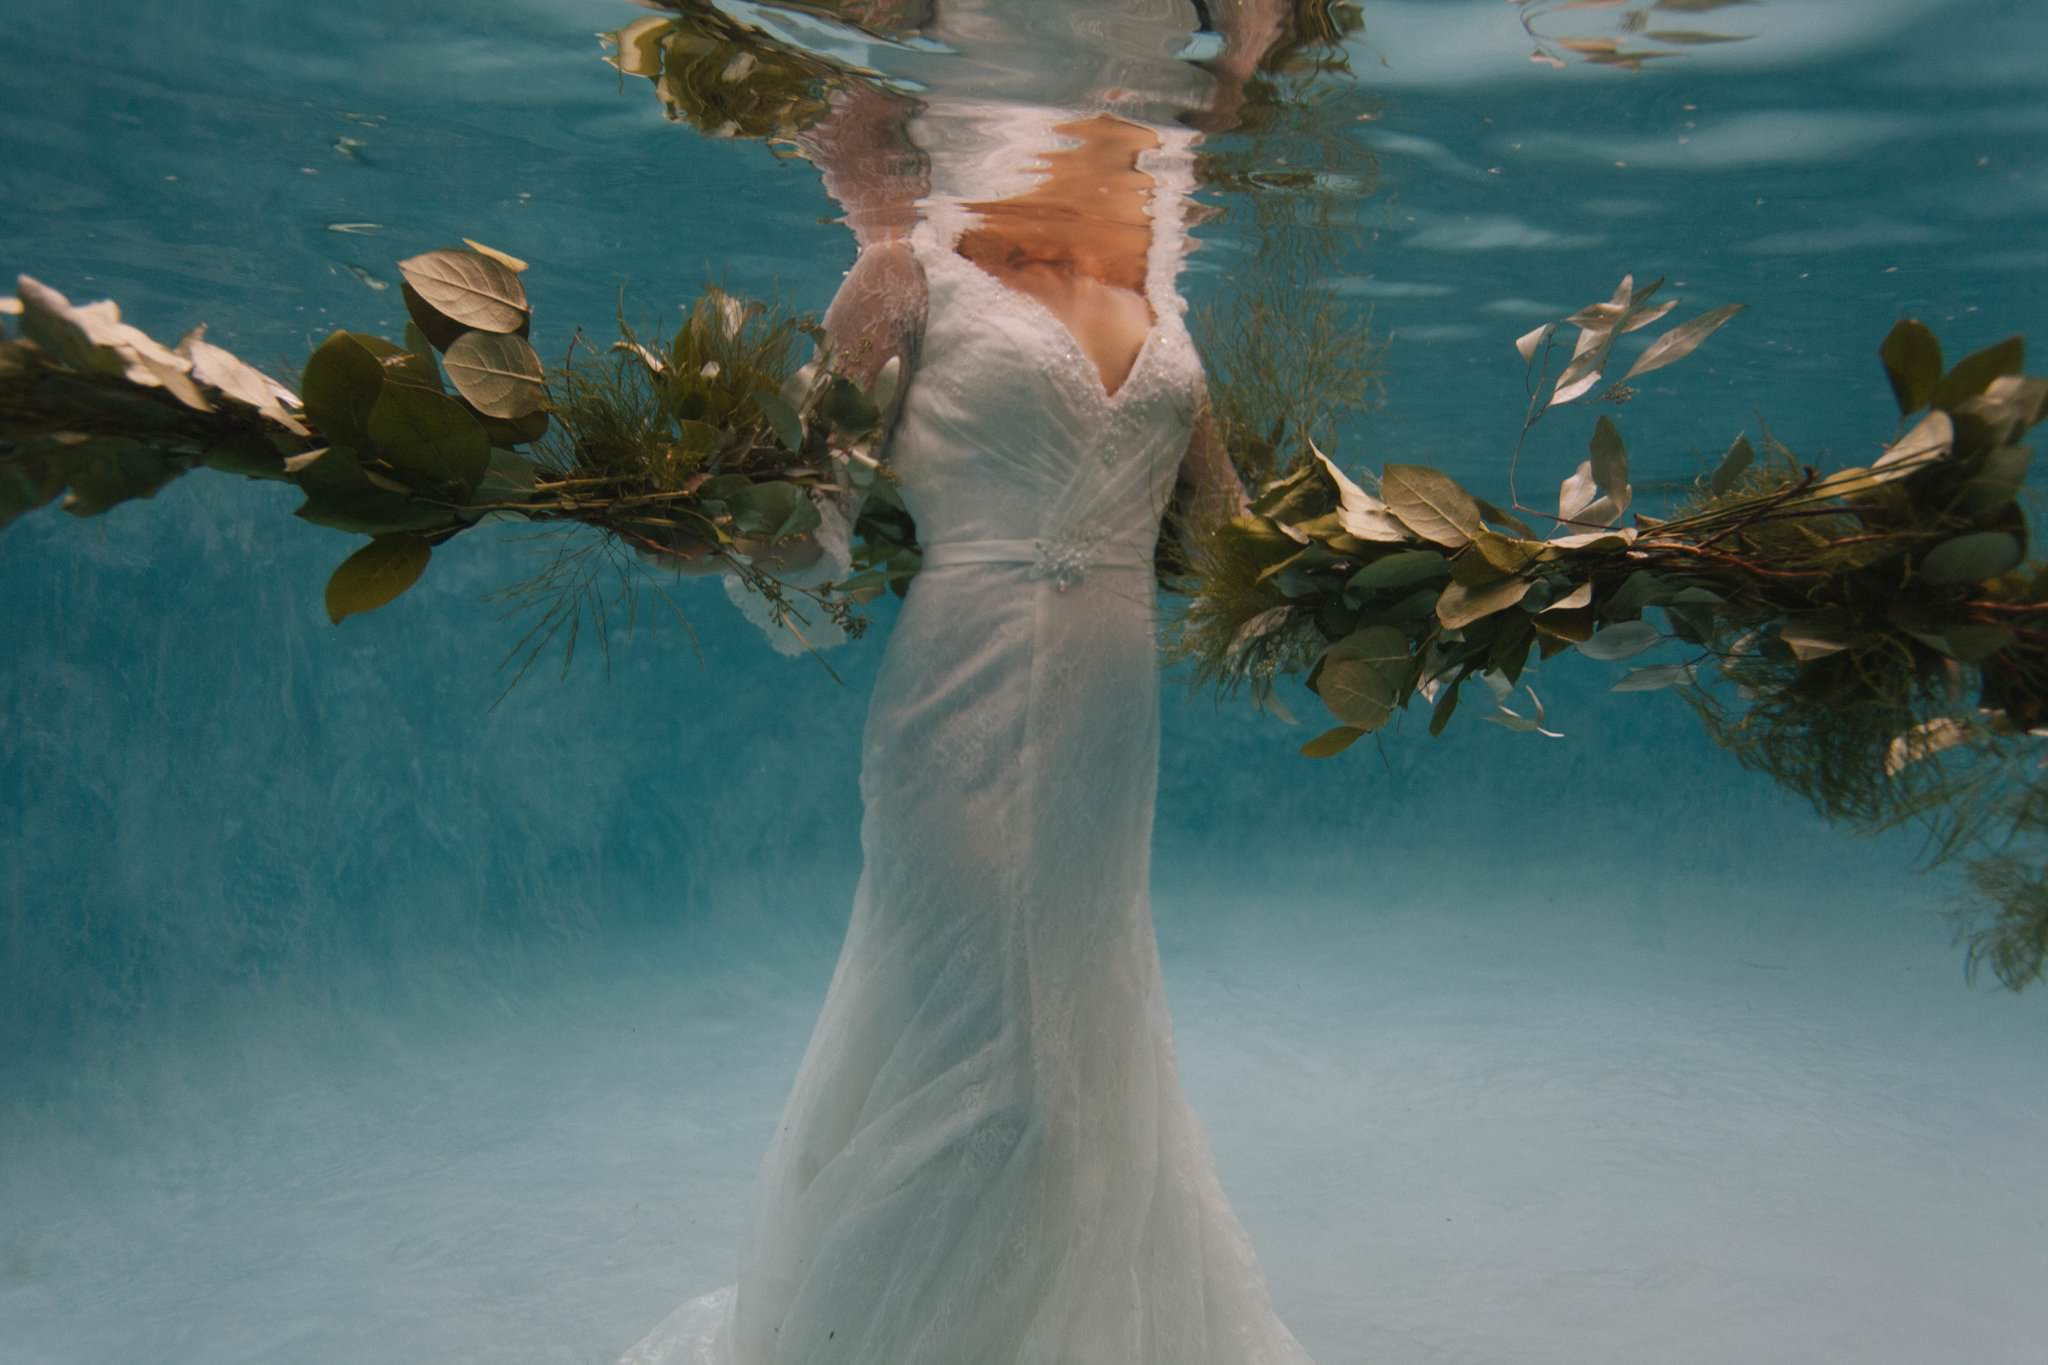 Arizona underwater trash the wedding dress